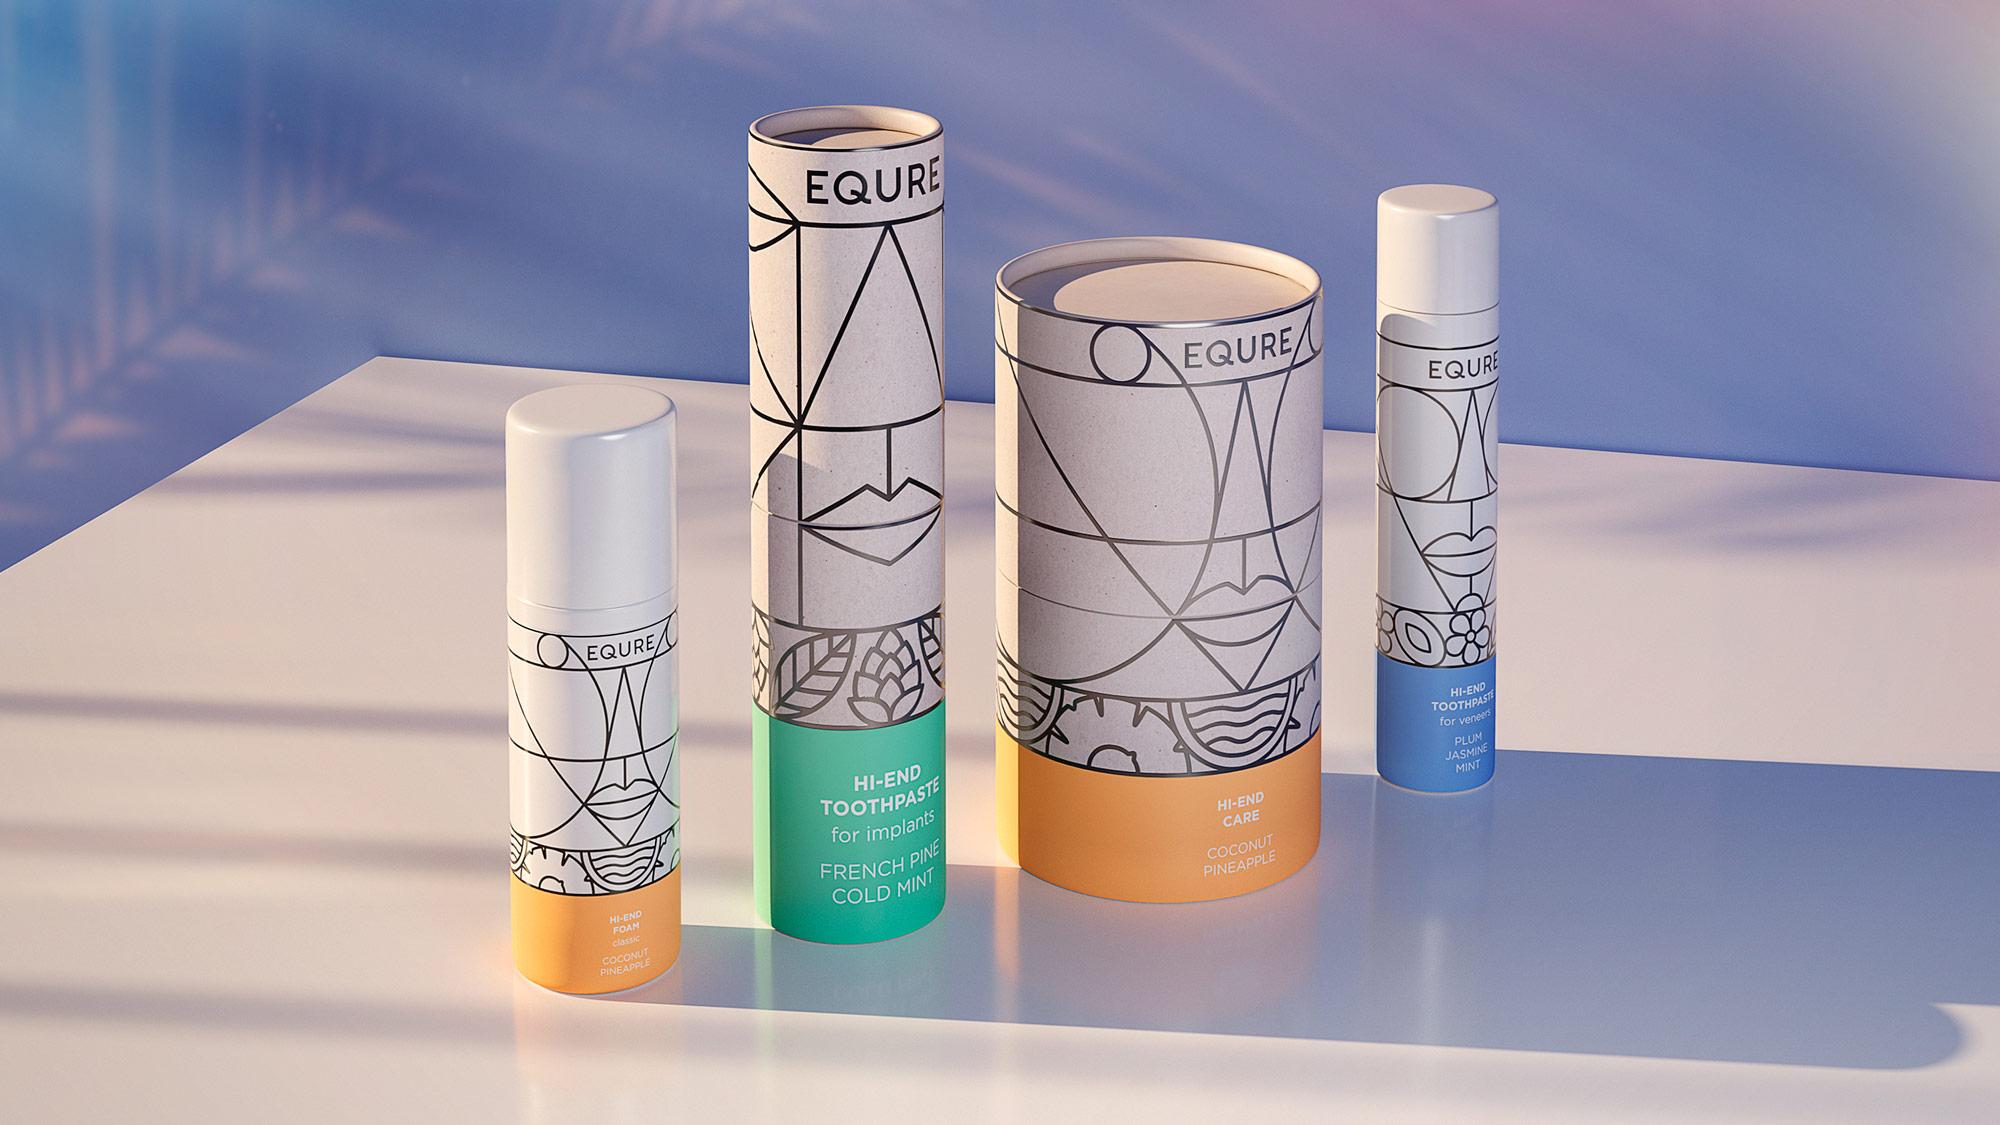 Repina Branding Develops Packaging Design for Equre